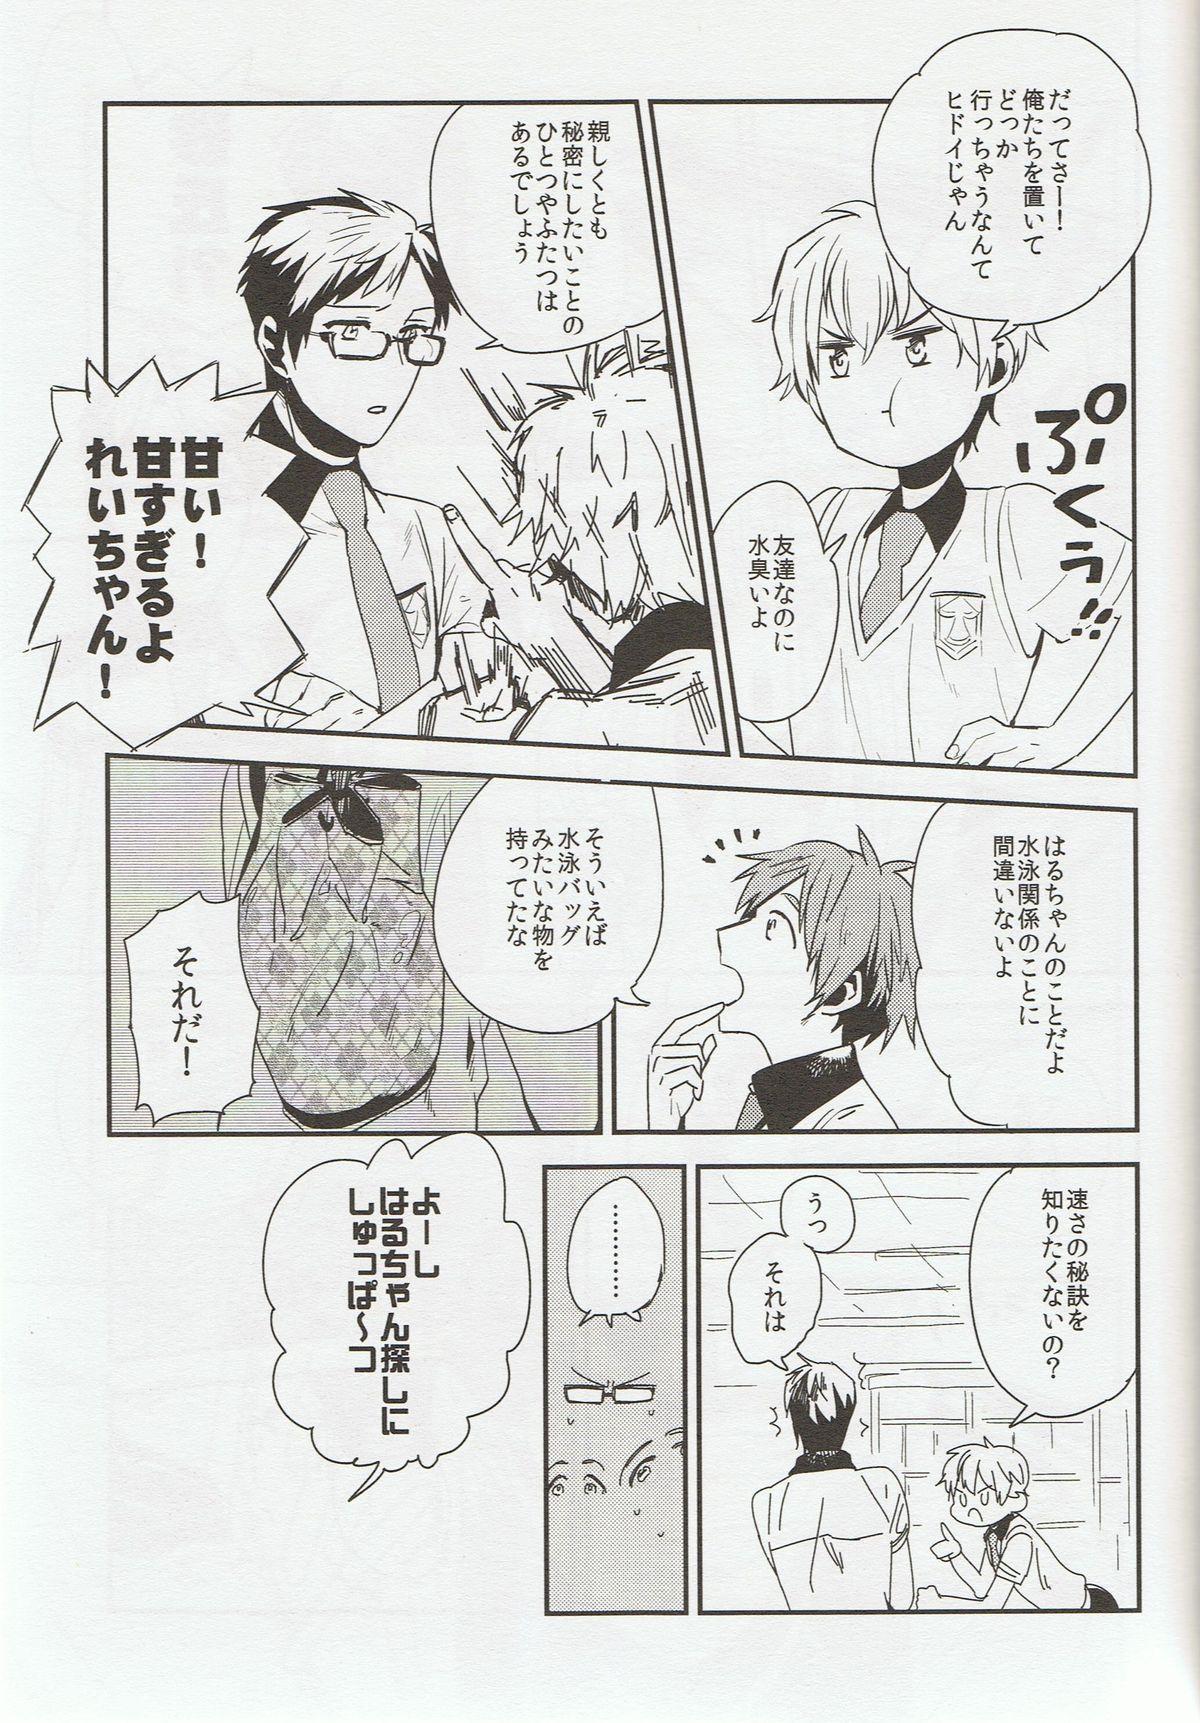 Sou da, Tottori Sakyuu Ikou. 25